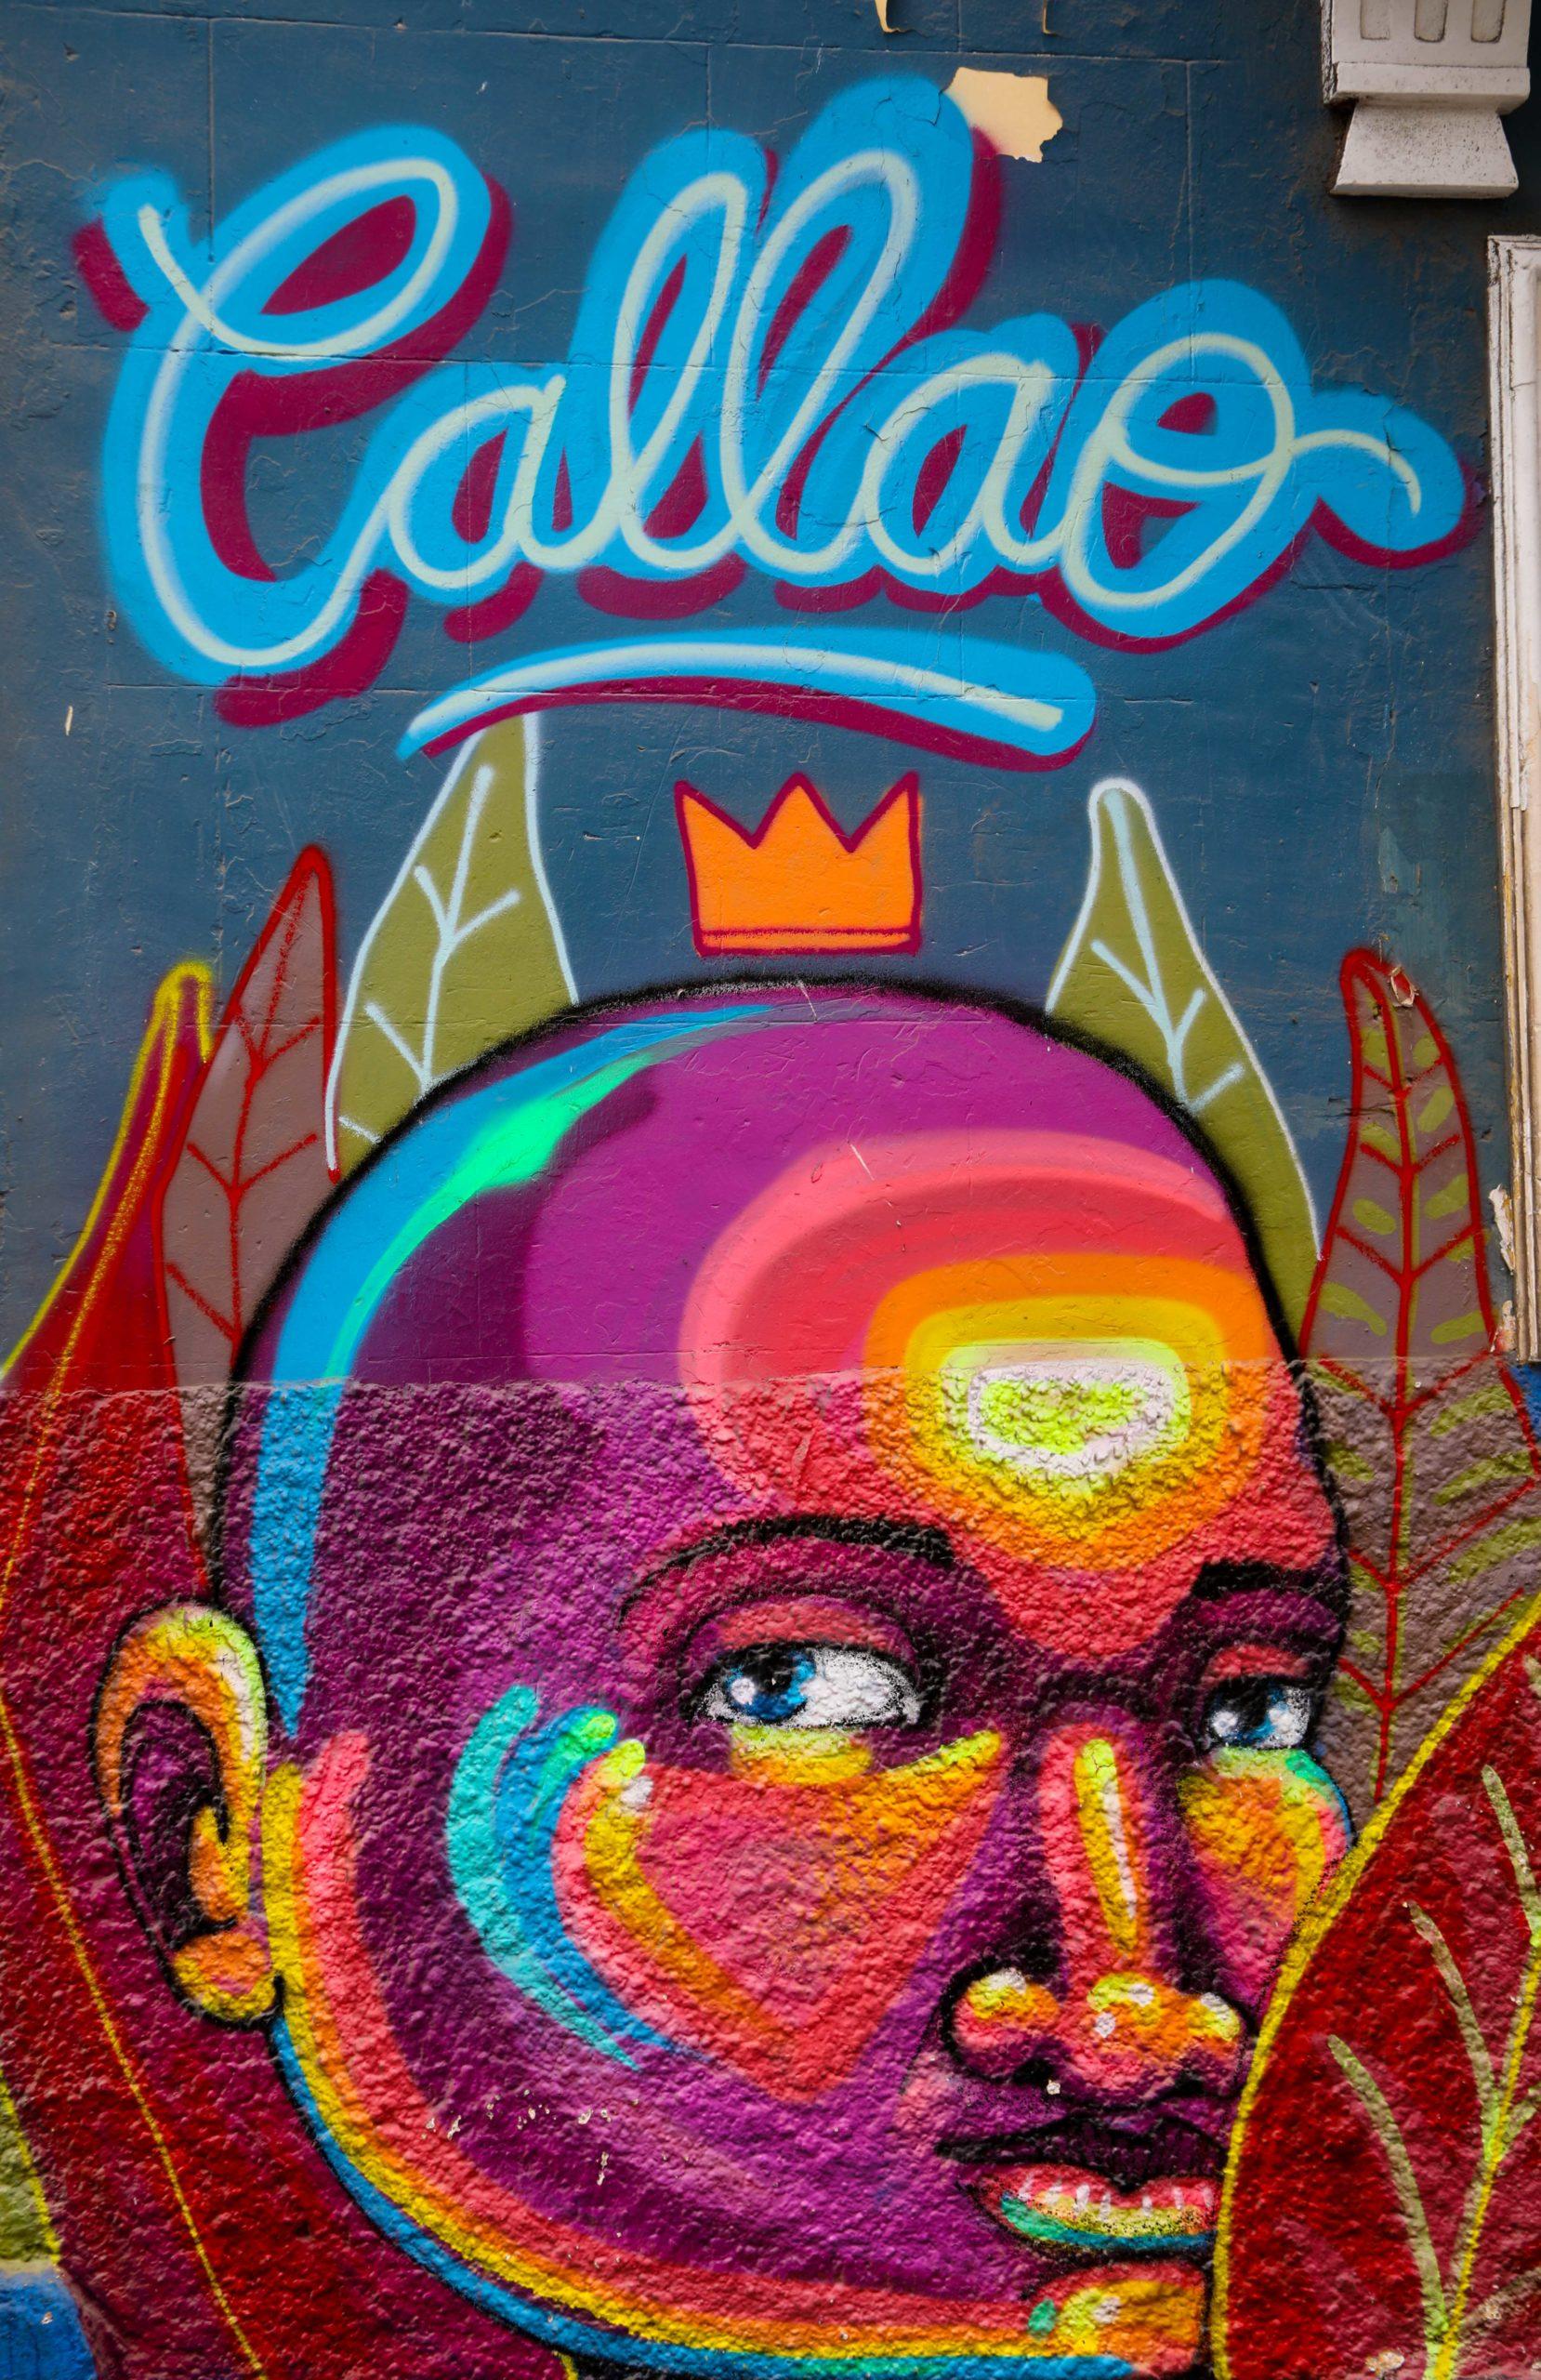 Reclaiming Callao